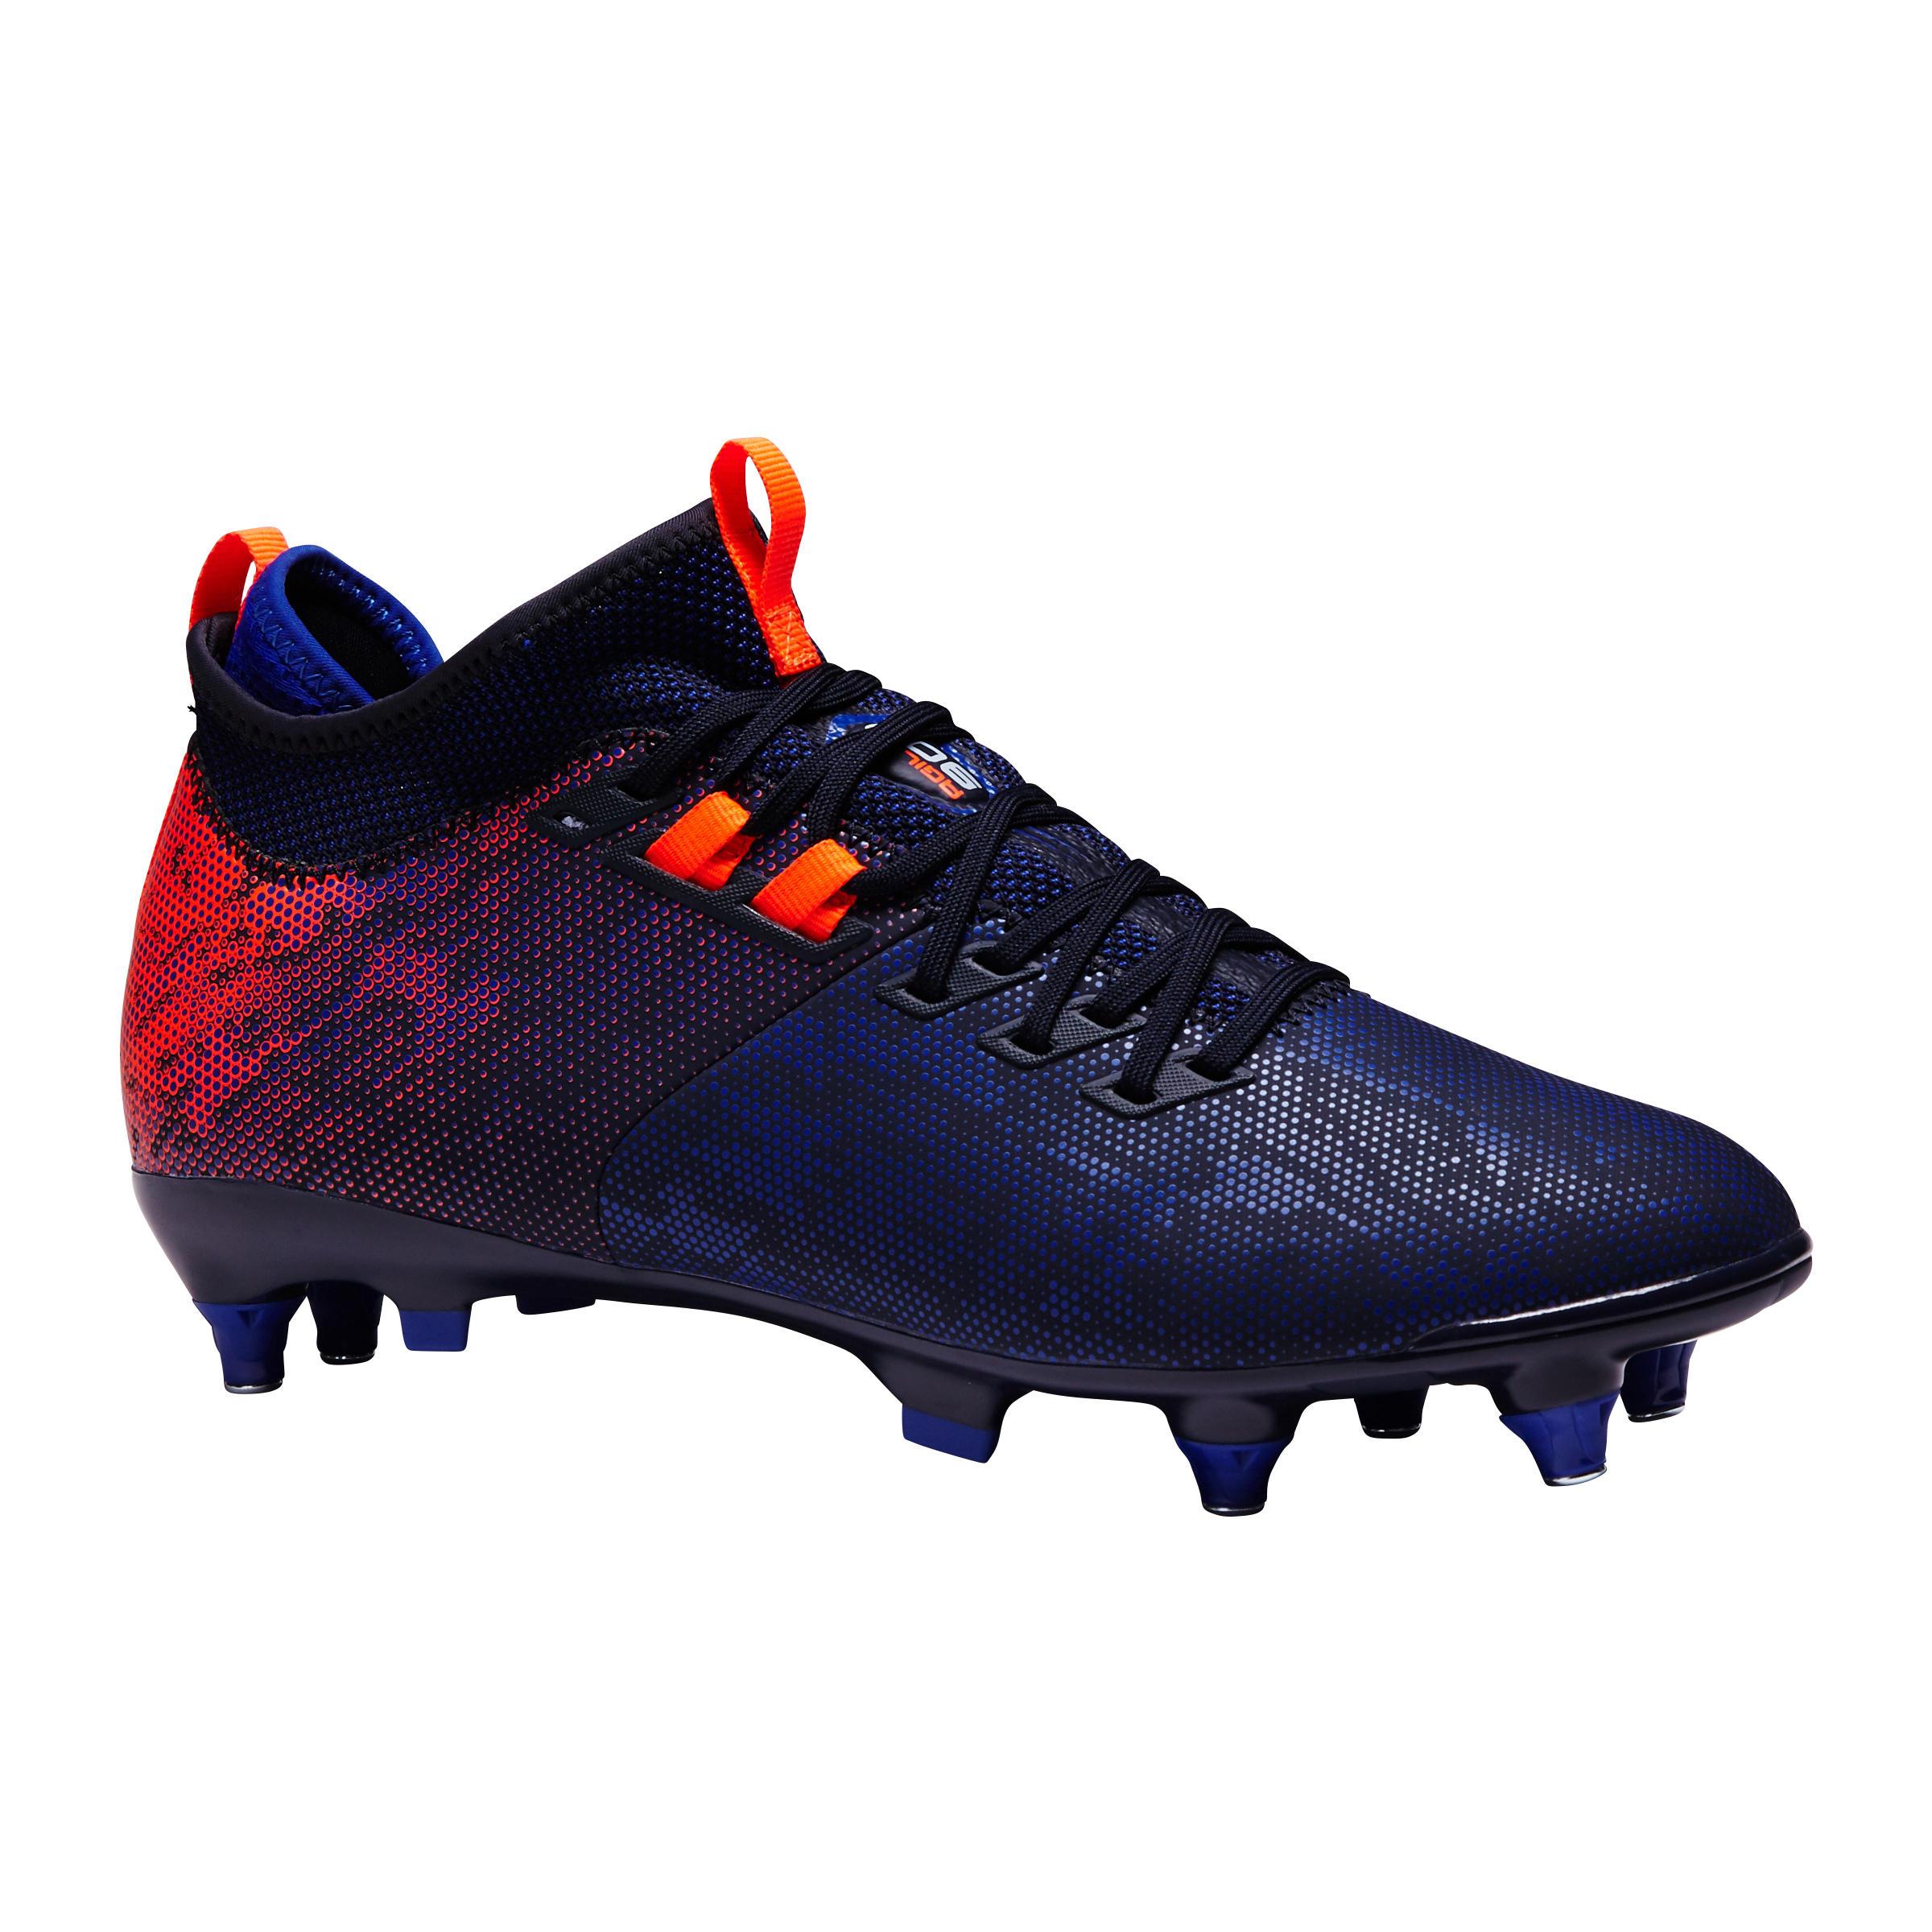 Kipsta Voetbalschoenen Agility 900 Mid SG blauw/oranje